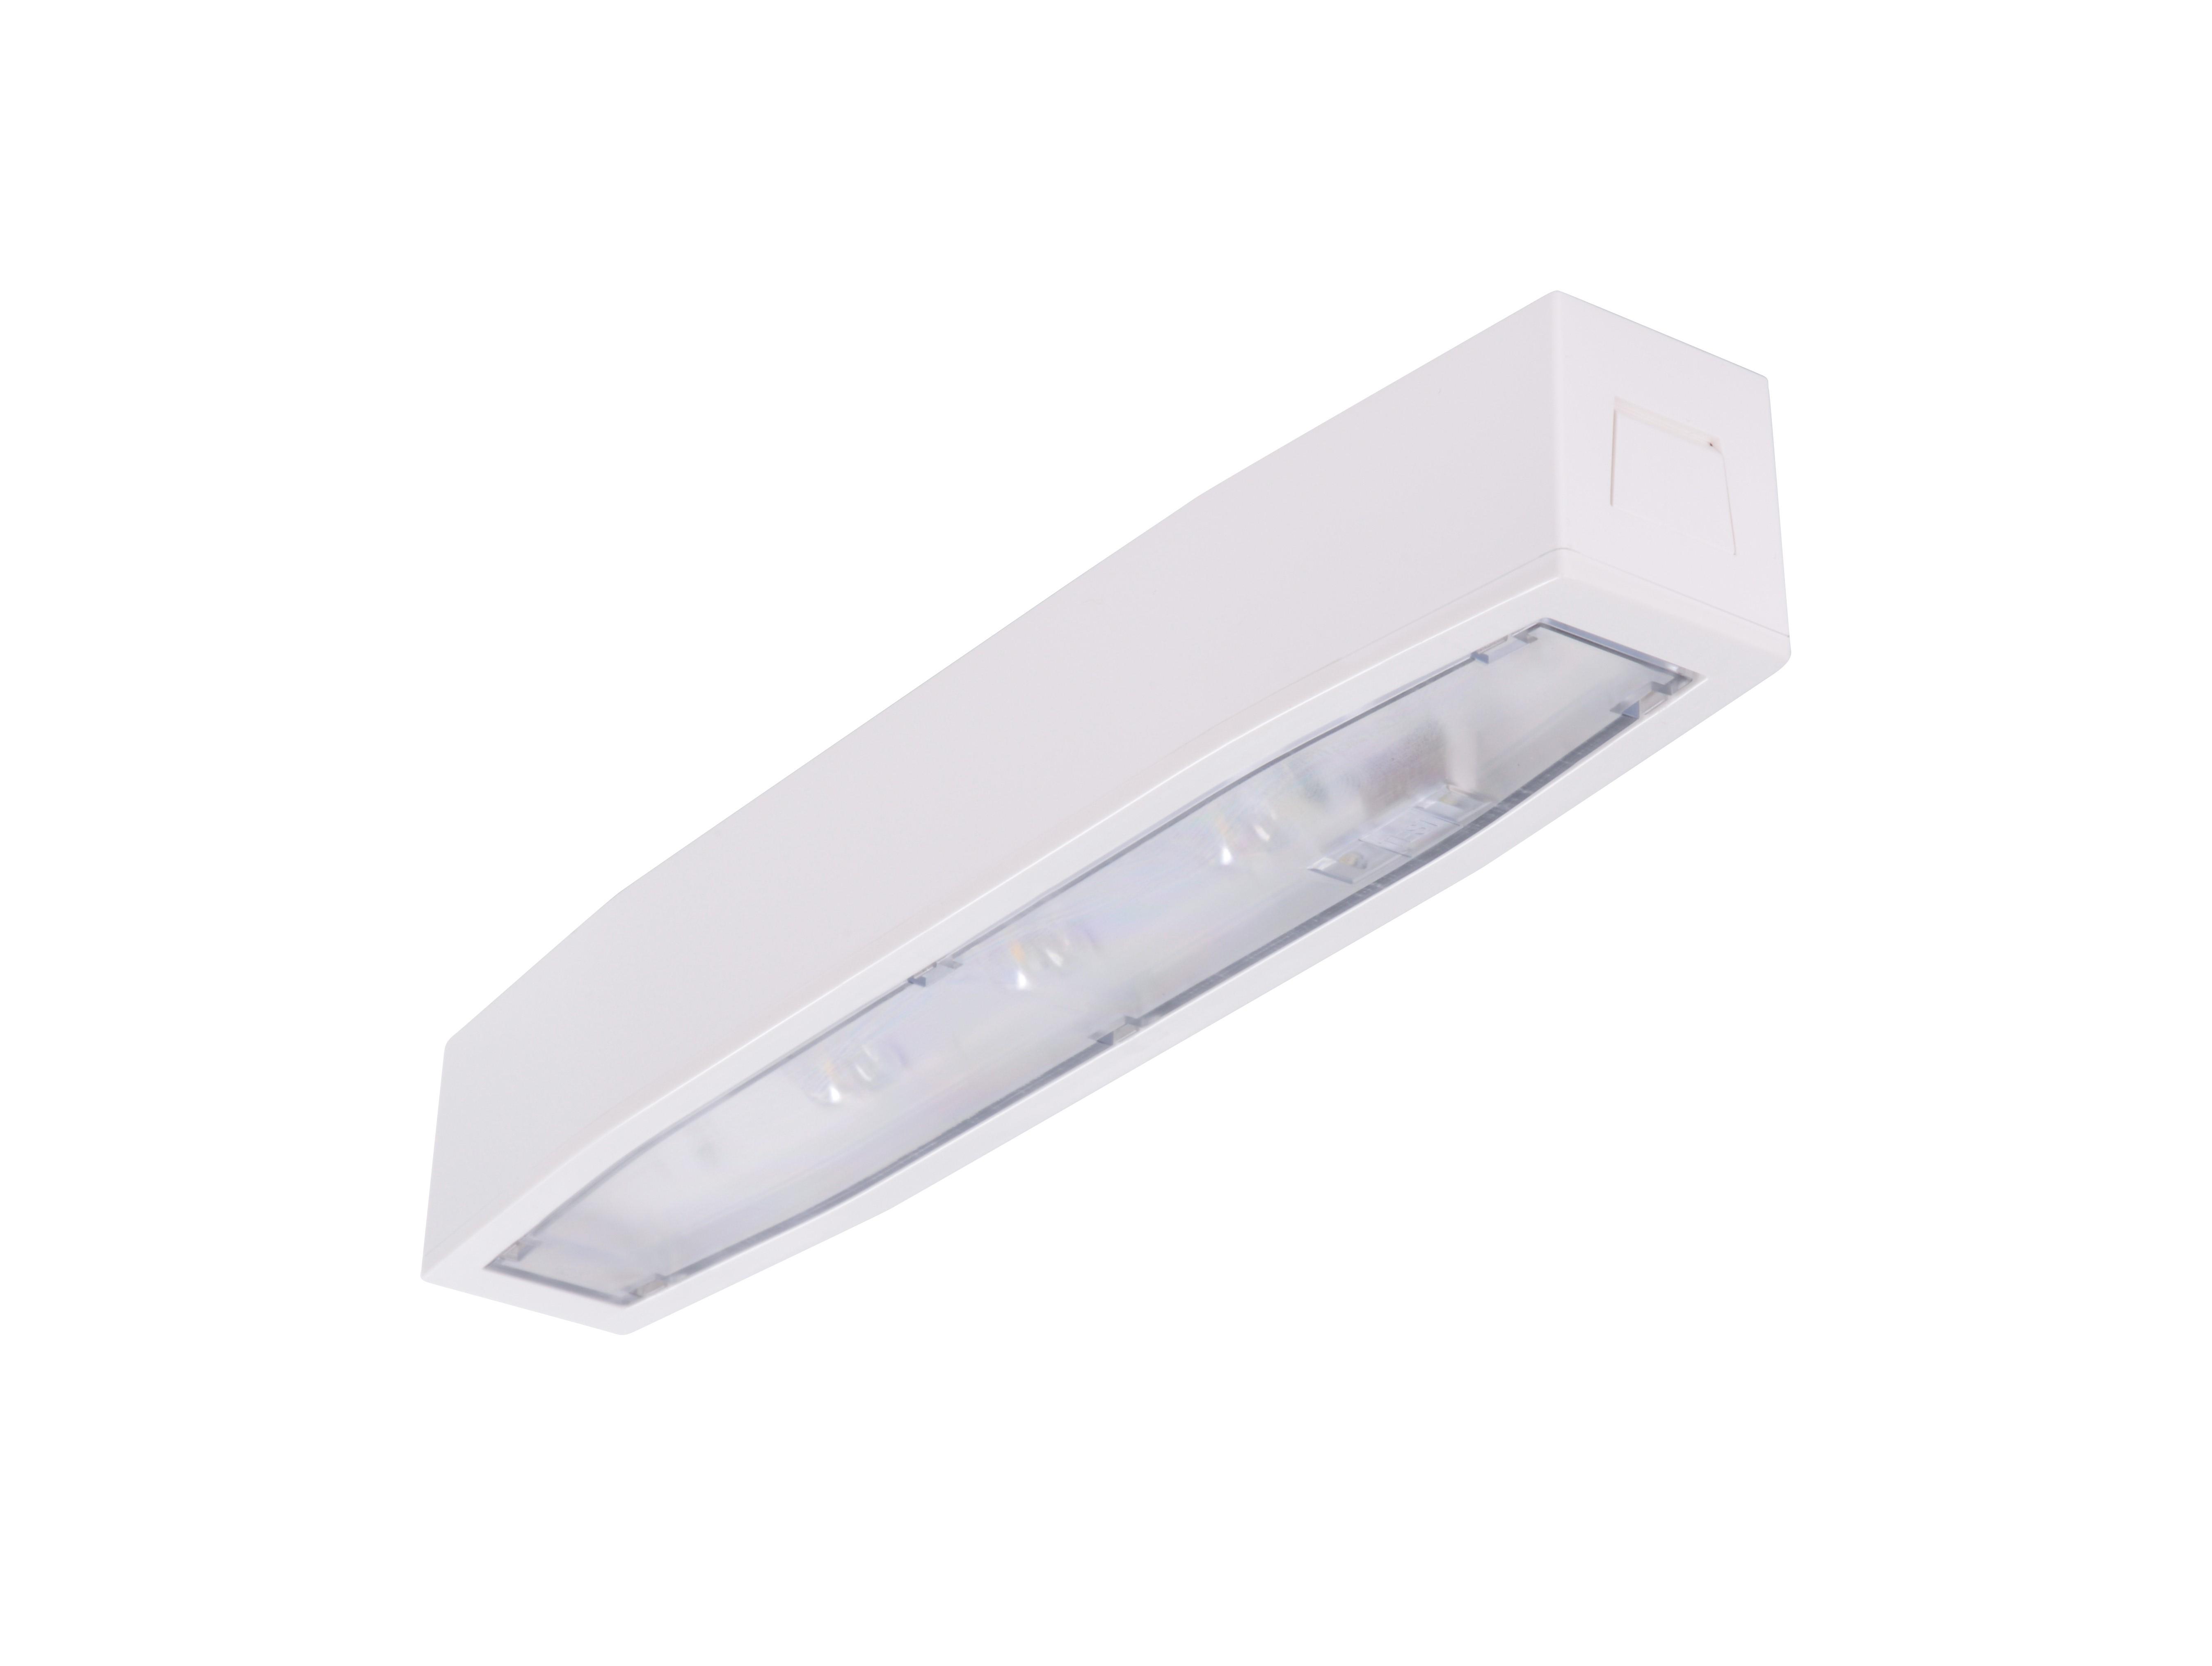 Lampa emergenta led Intelight 94719   3h nementinut test automat 0